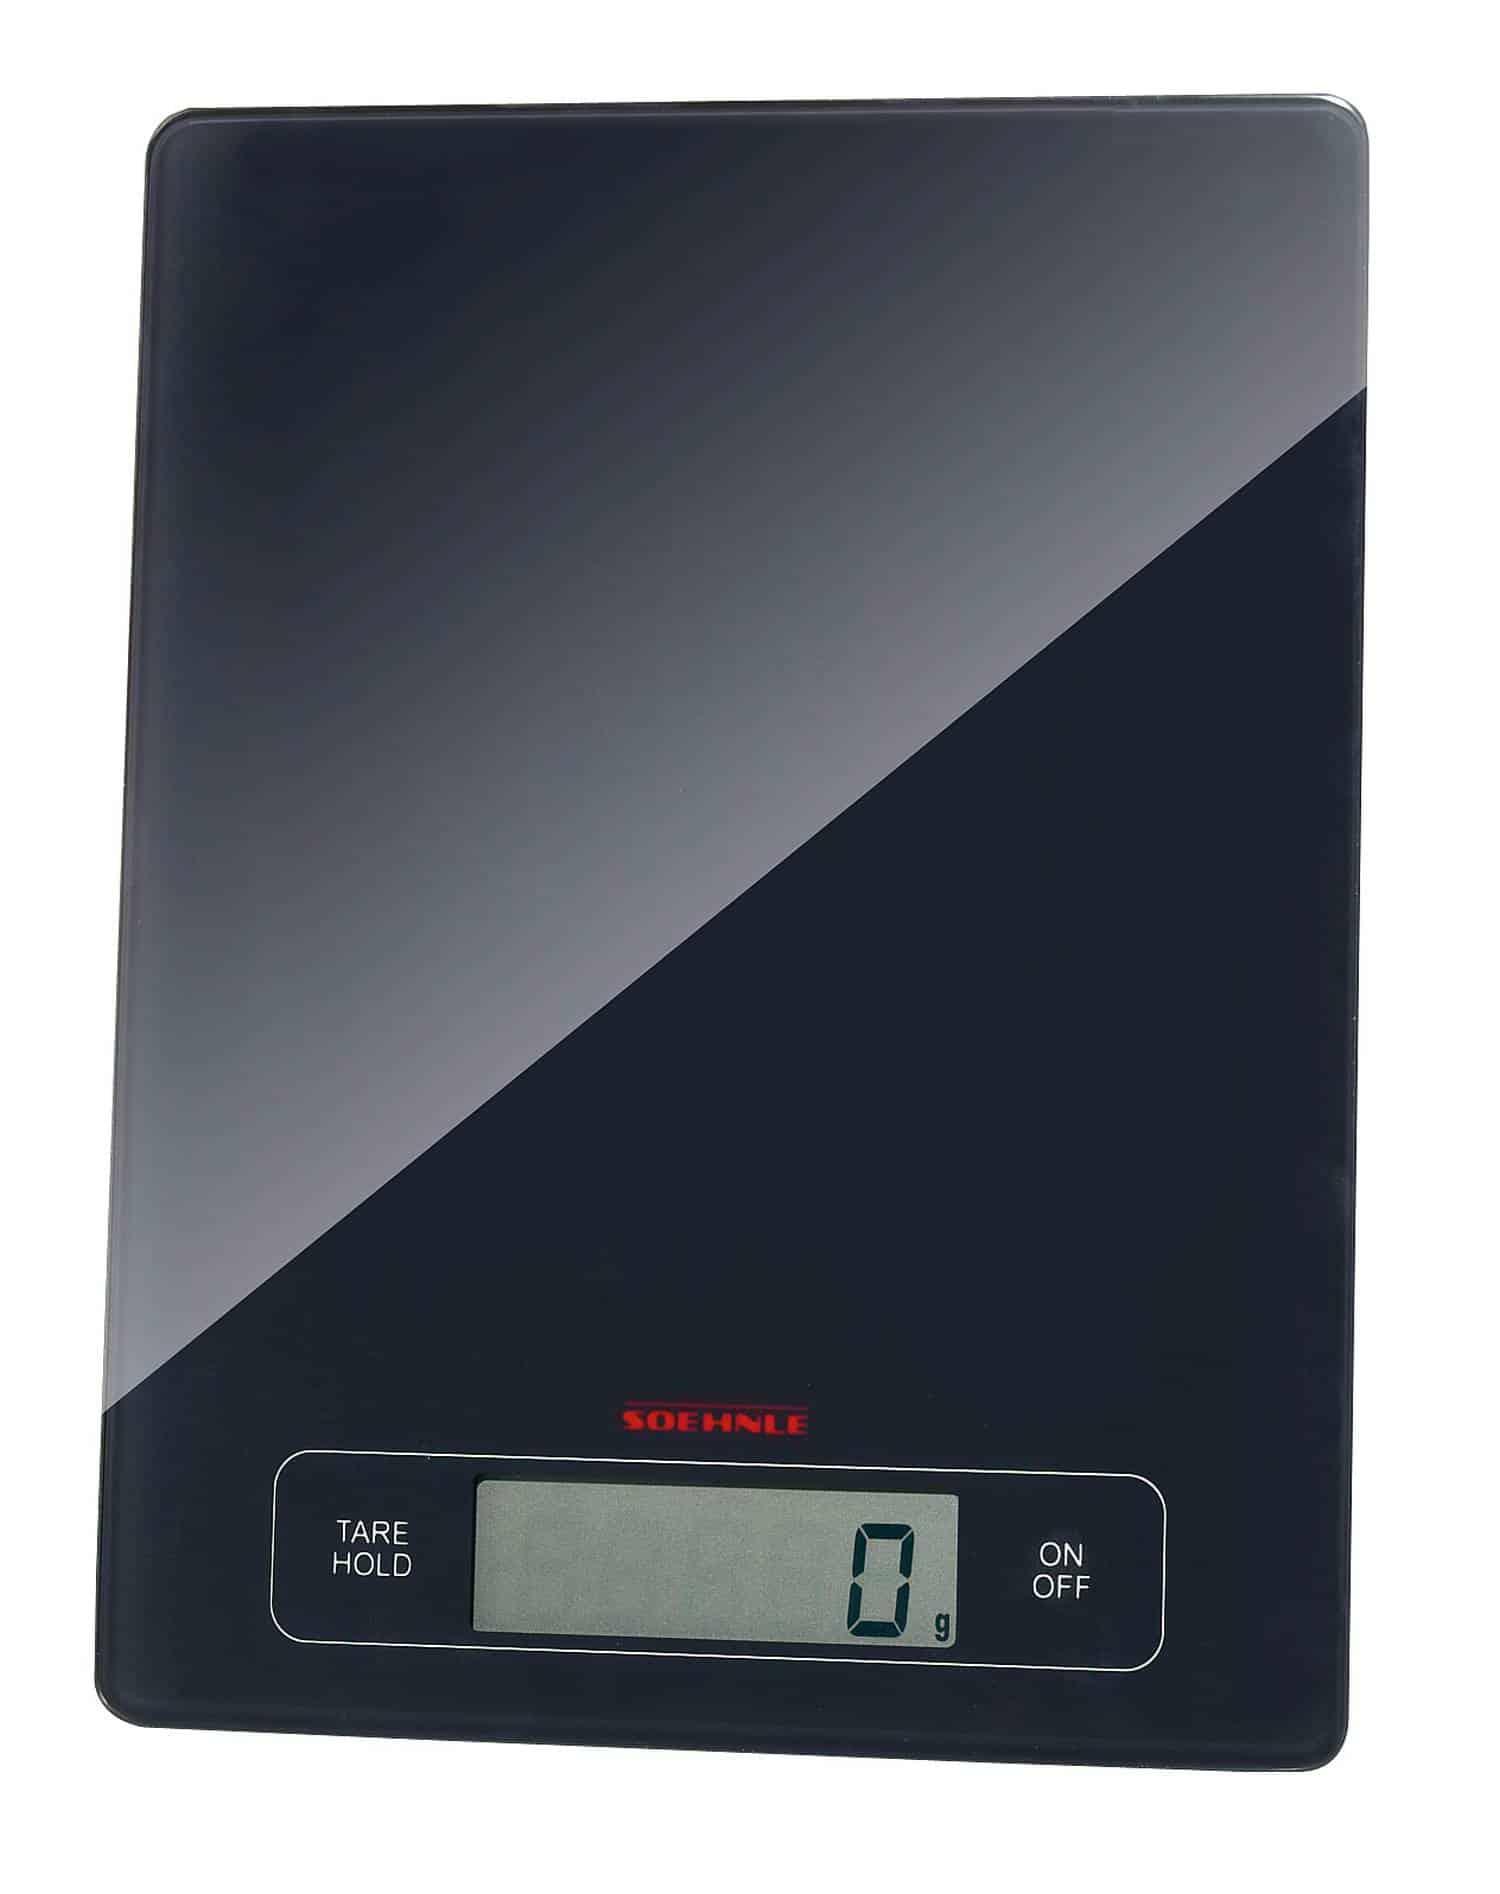 Küchenwaage Digital weiß Glas Waage Digital Waage LCD Display Briefwaage